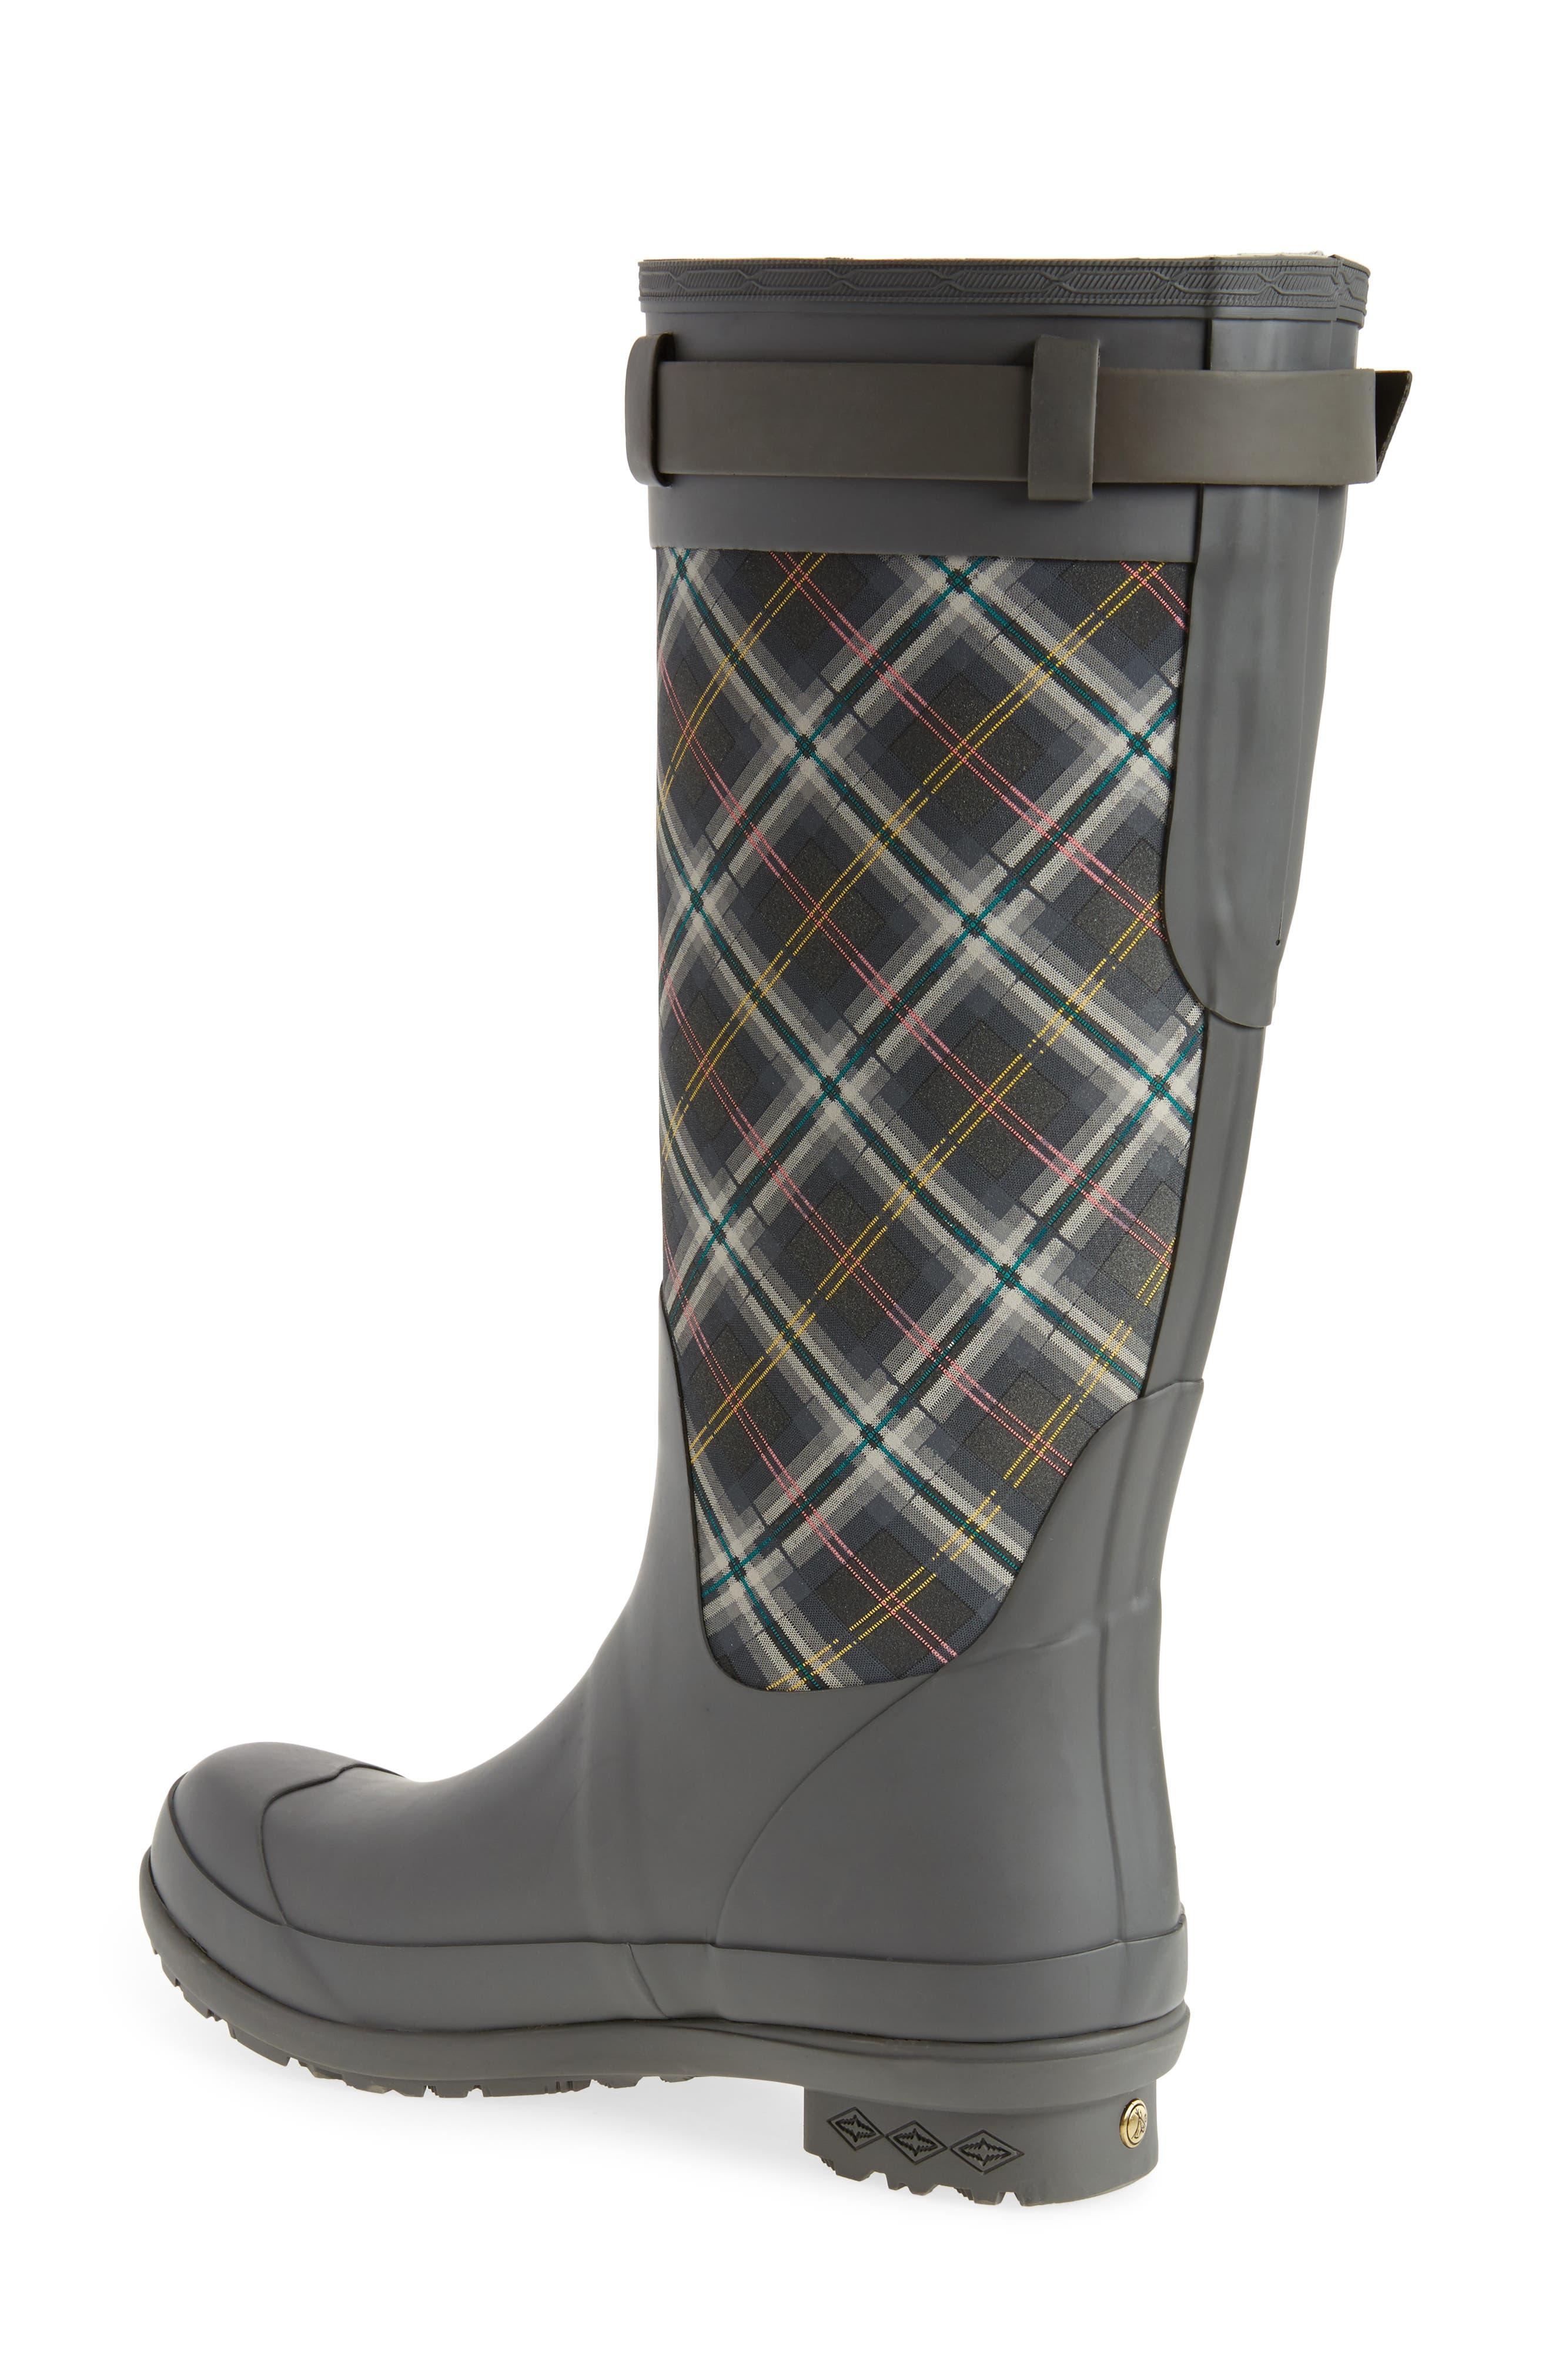 Pendleton Oxford Rain Boot,                             Alternate thumbnail 2, color,                             GRAY